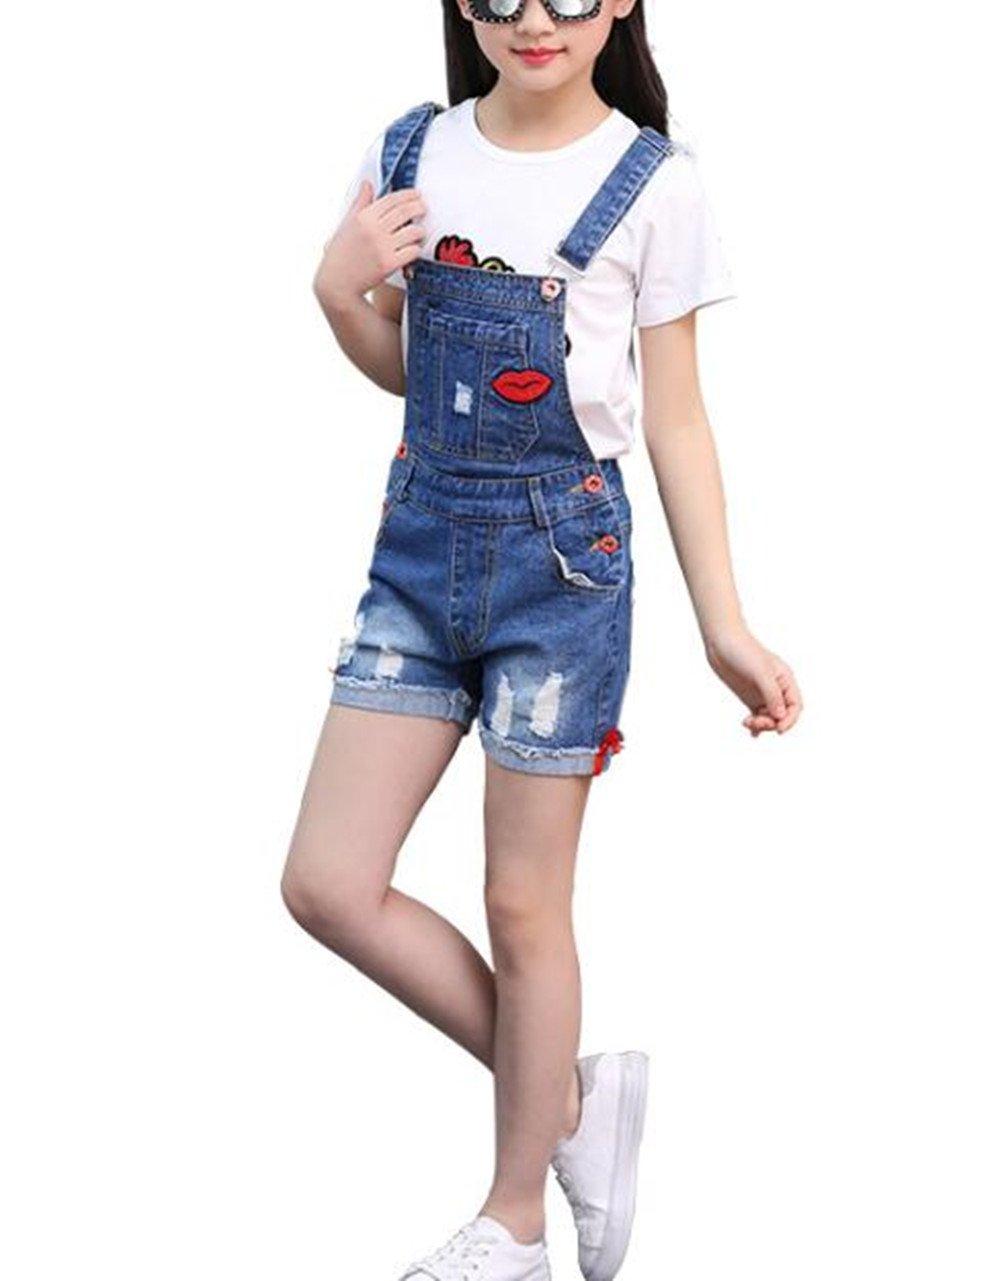 Big Girl's Denim Jumpsuit Boyfriend Jeans Cute Fashion Denim Romper Shortalls 9-10Years by Juakita Barpsa (Image #1)